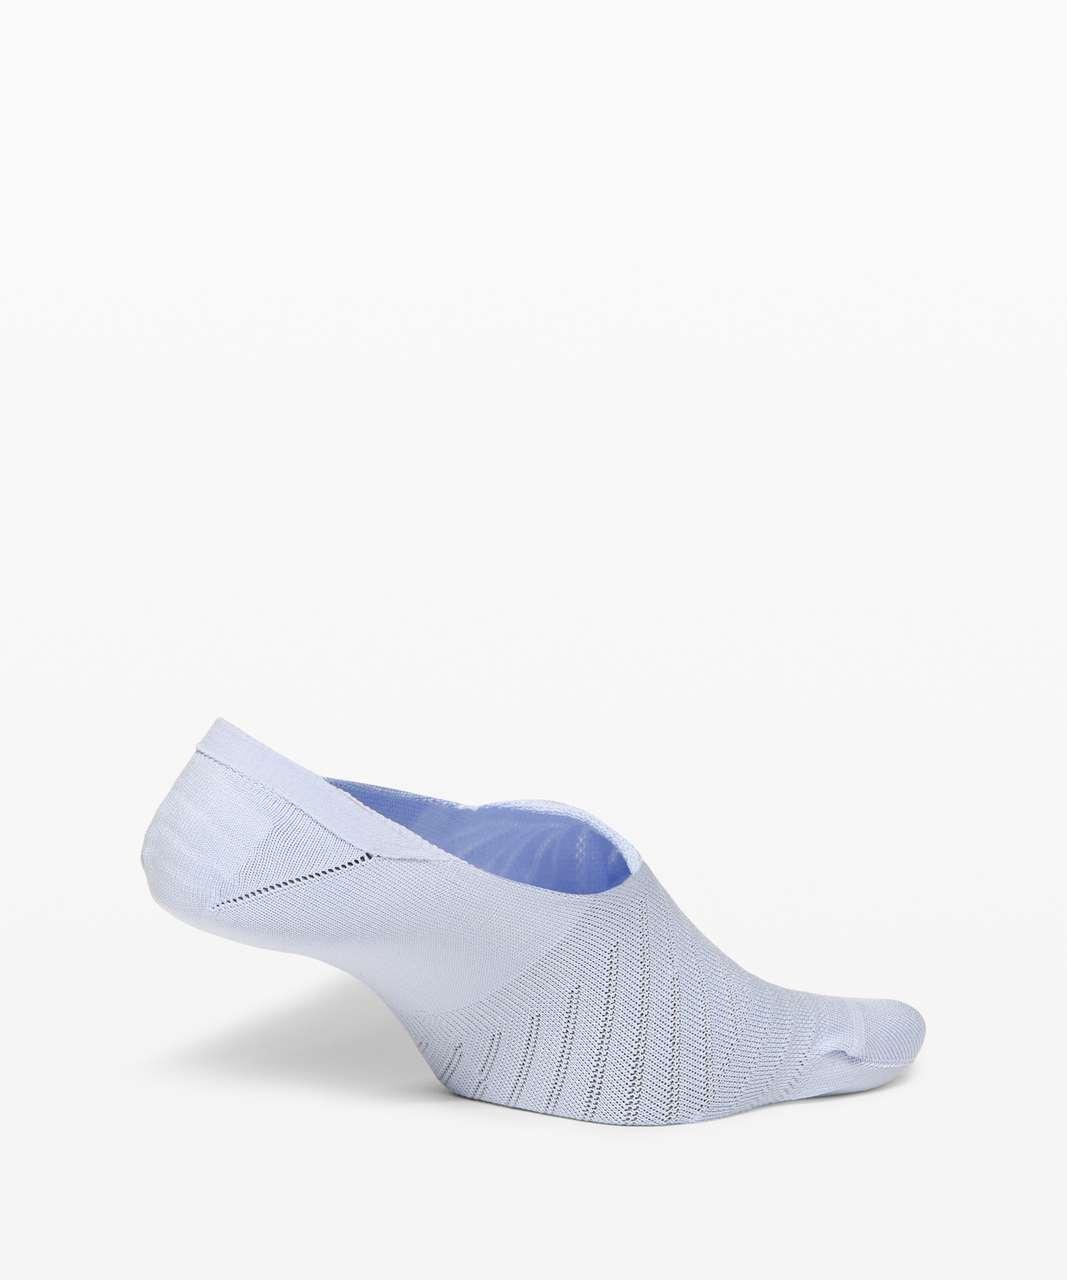 Lululemon Secret Sock - Daydream